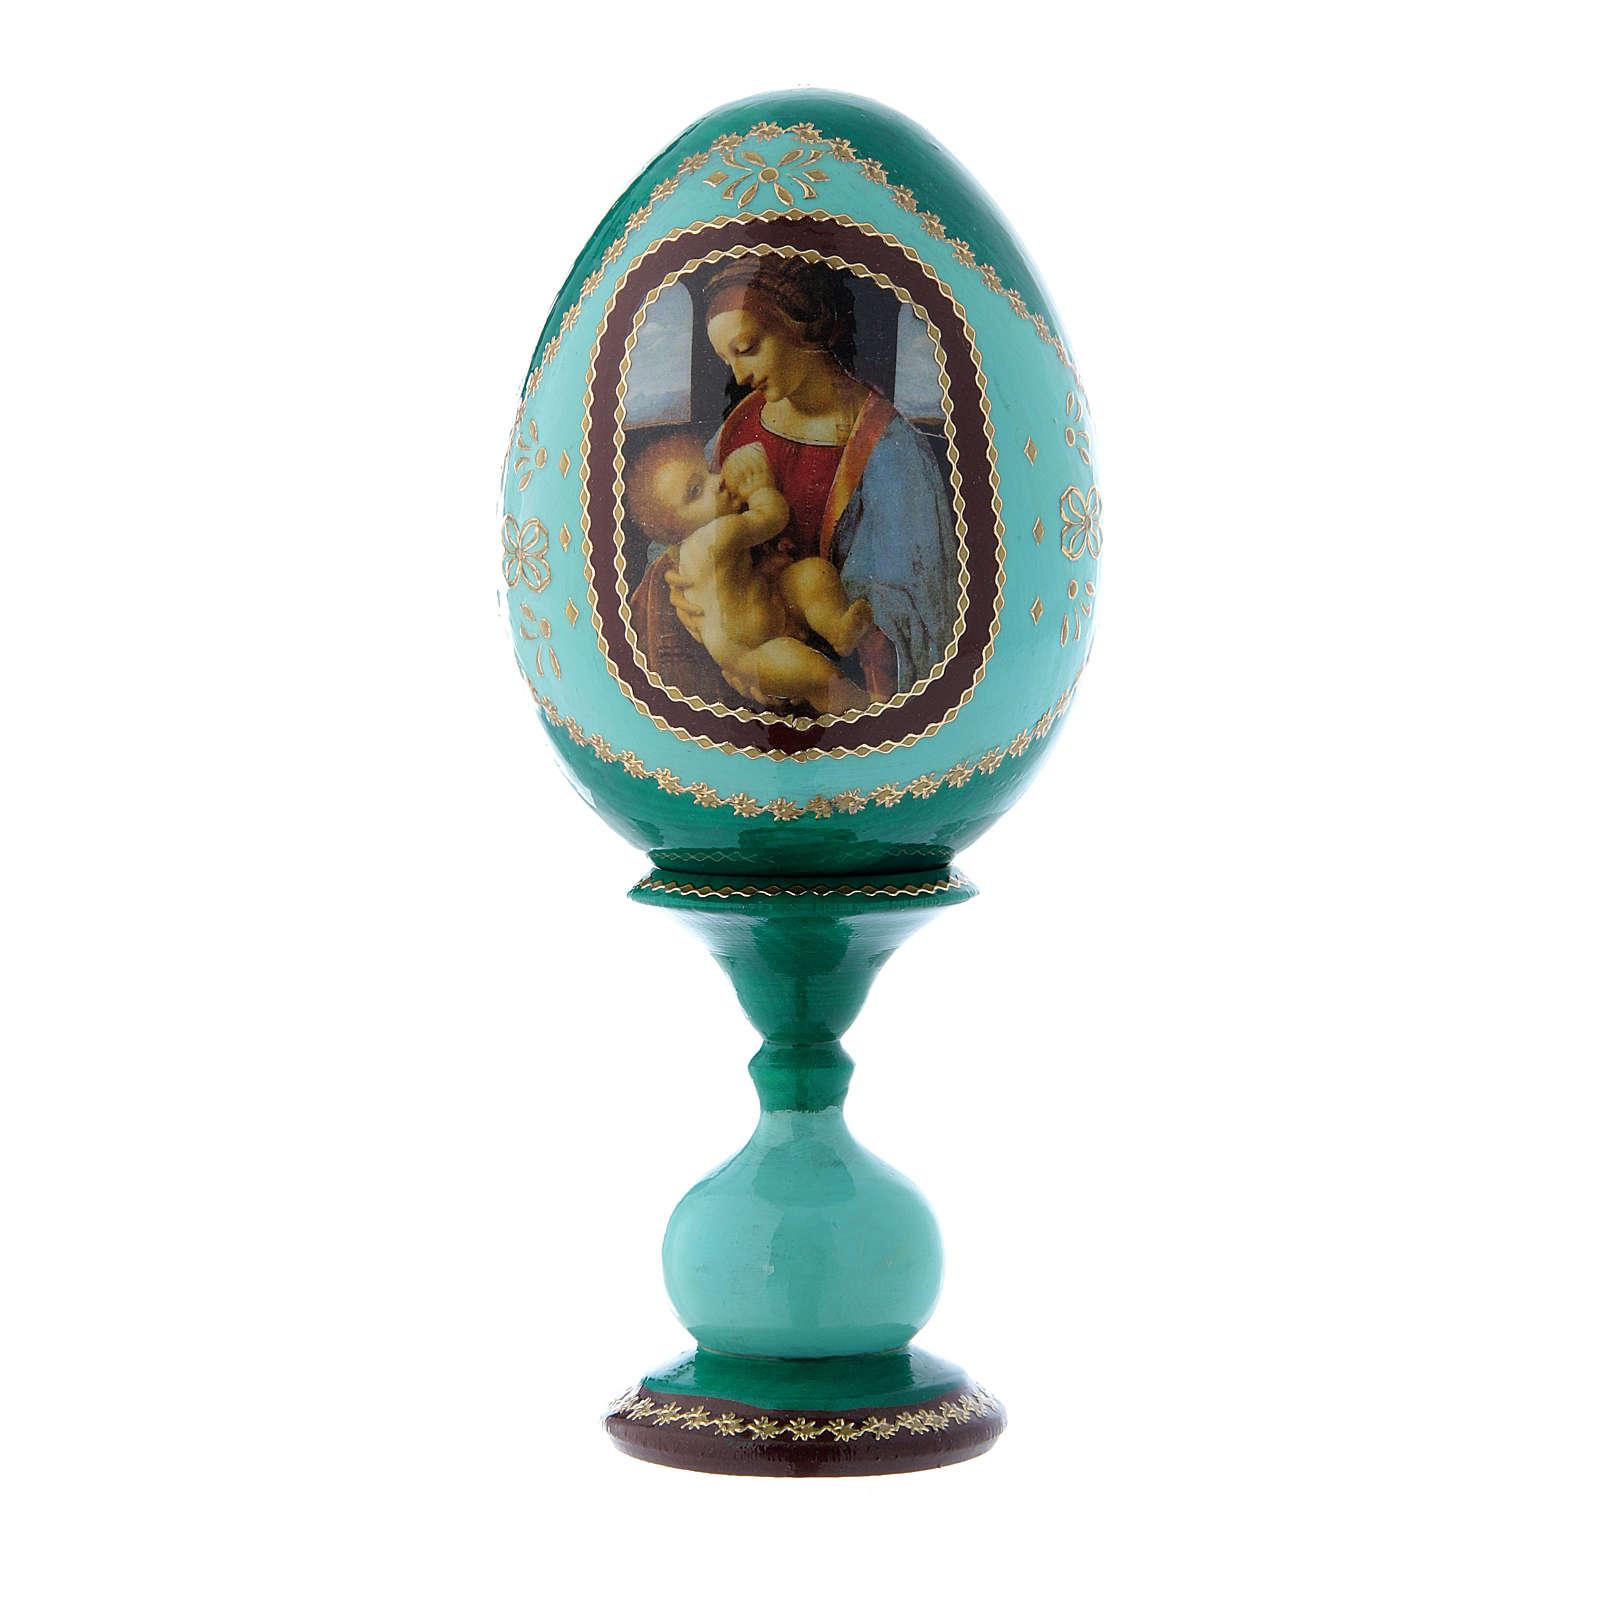 Oeuf vert en bois découpage russe La Madone Litta h tot 16 cm 4